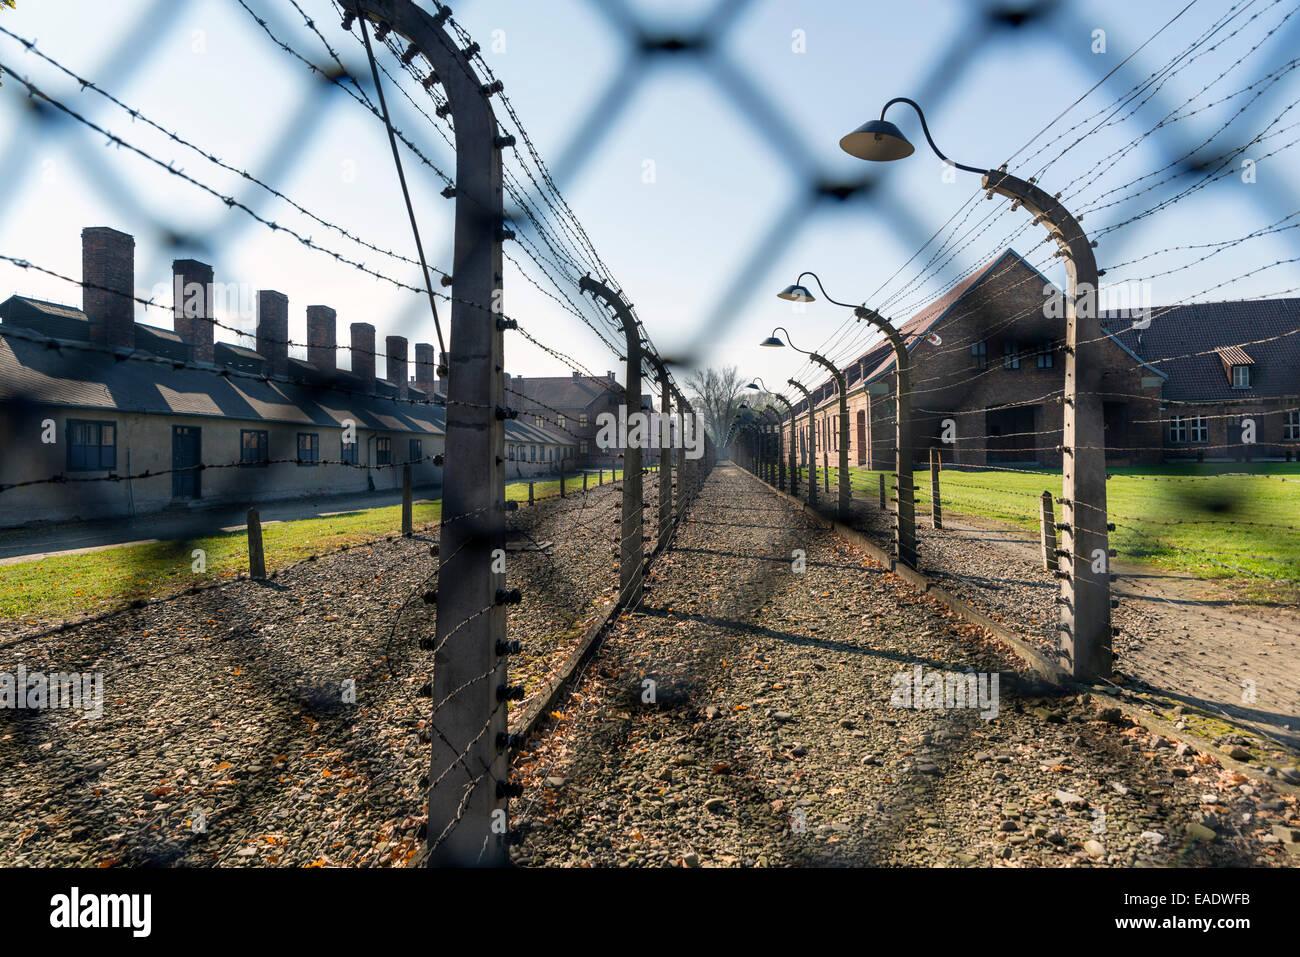 AUSCHWITZ, POLAND - OCTOBER 25, 2014: Auschwitz Camp, a former Nazi extermination camp  in Oswiecim, Poland. It - Stock Image